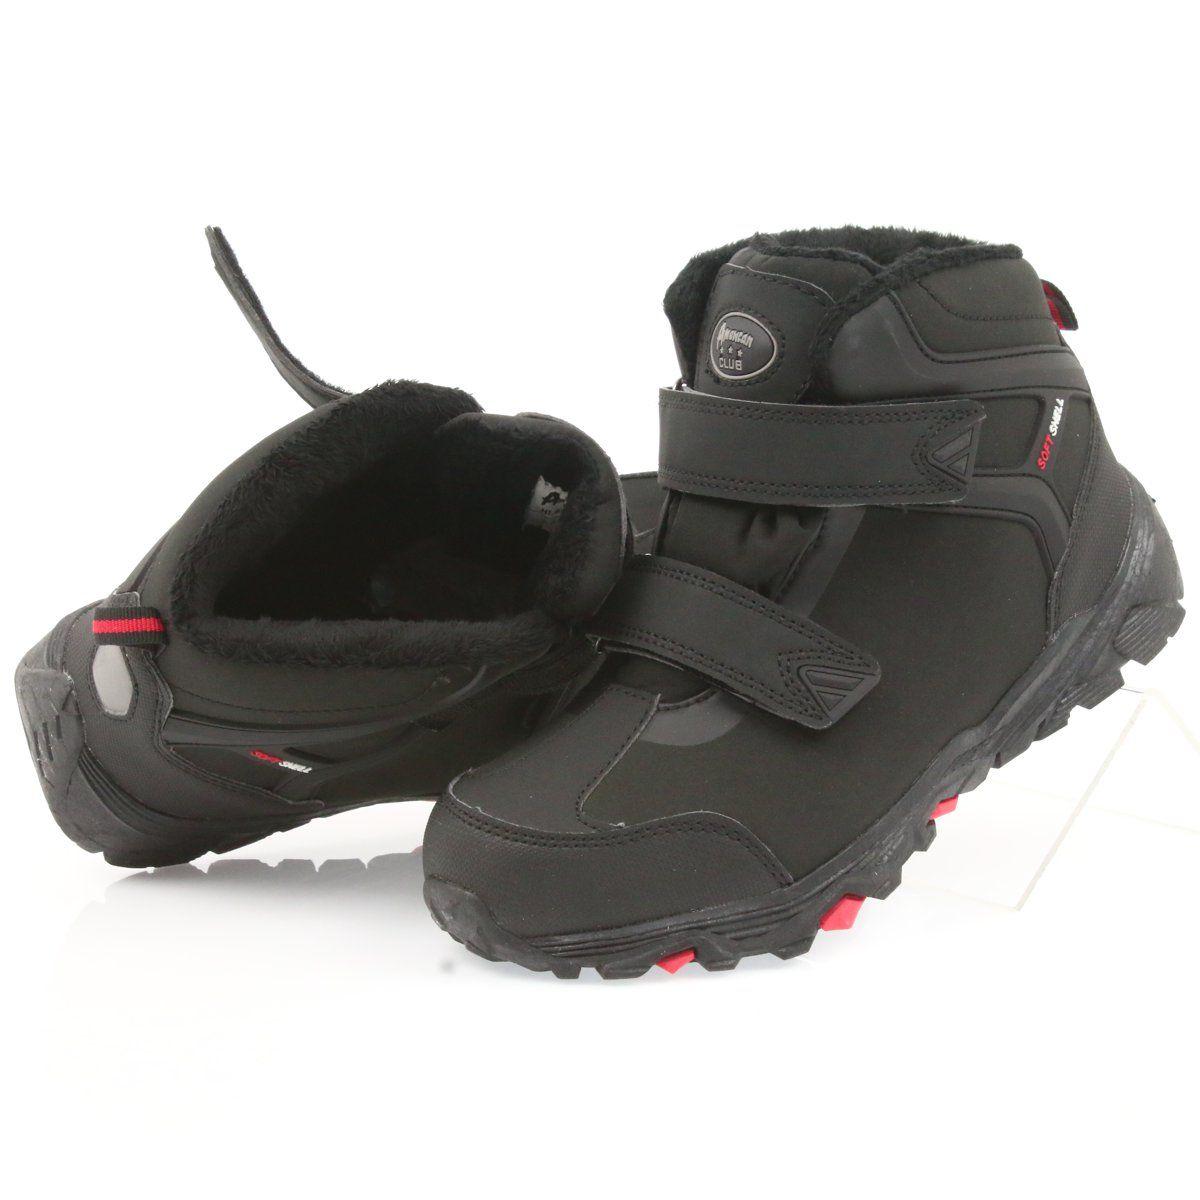 American Club American Trzewiki Buty Zimowe Z Membrana Czarne Boots Hiking Boots Softshell